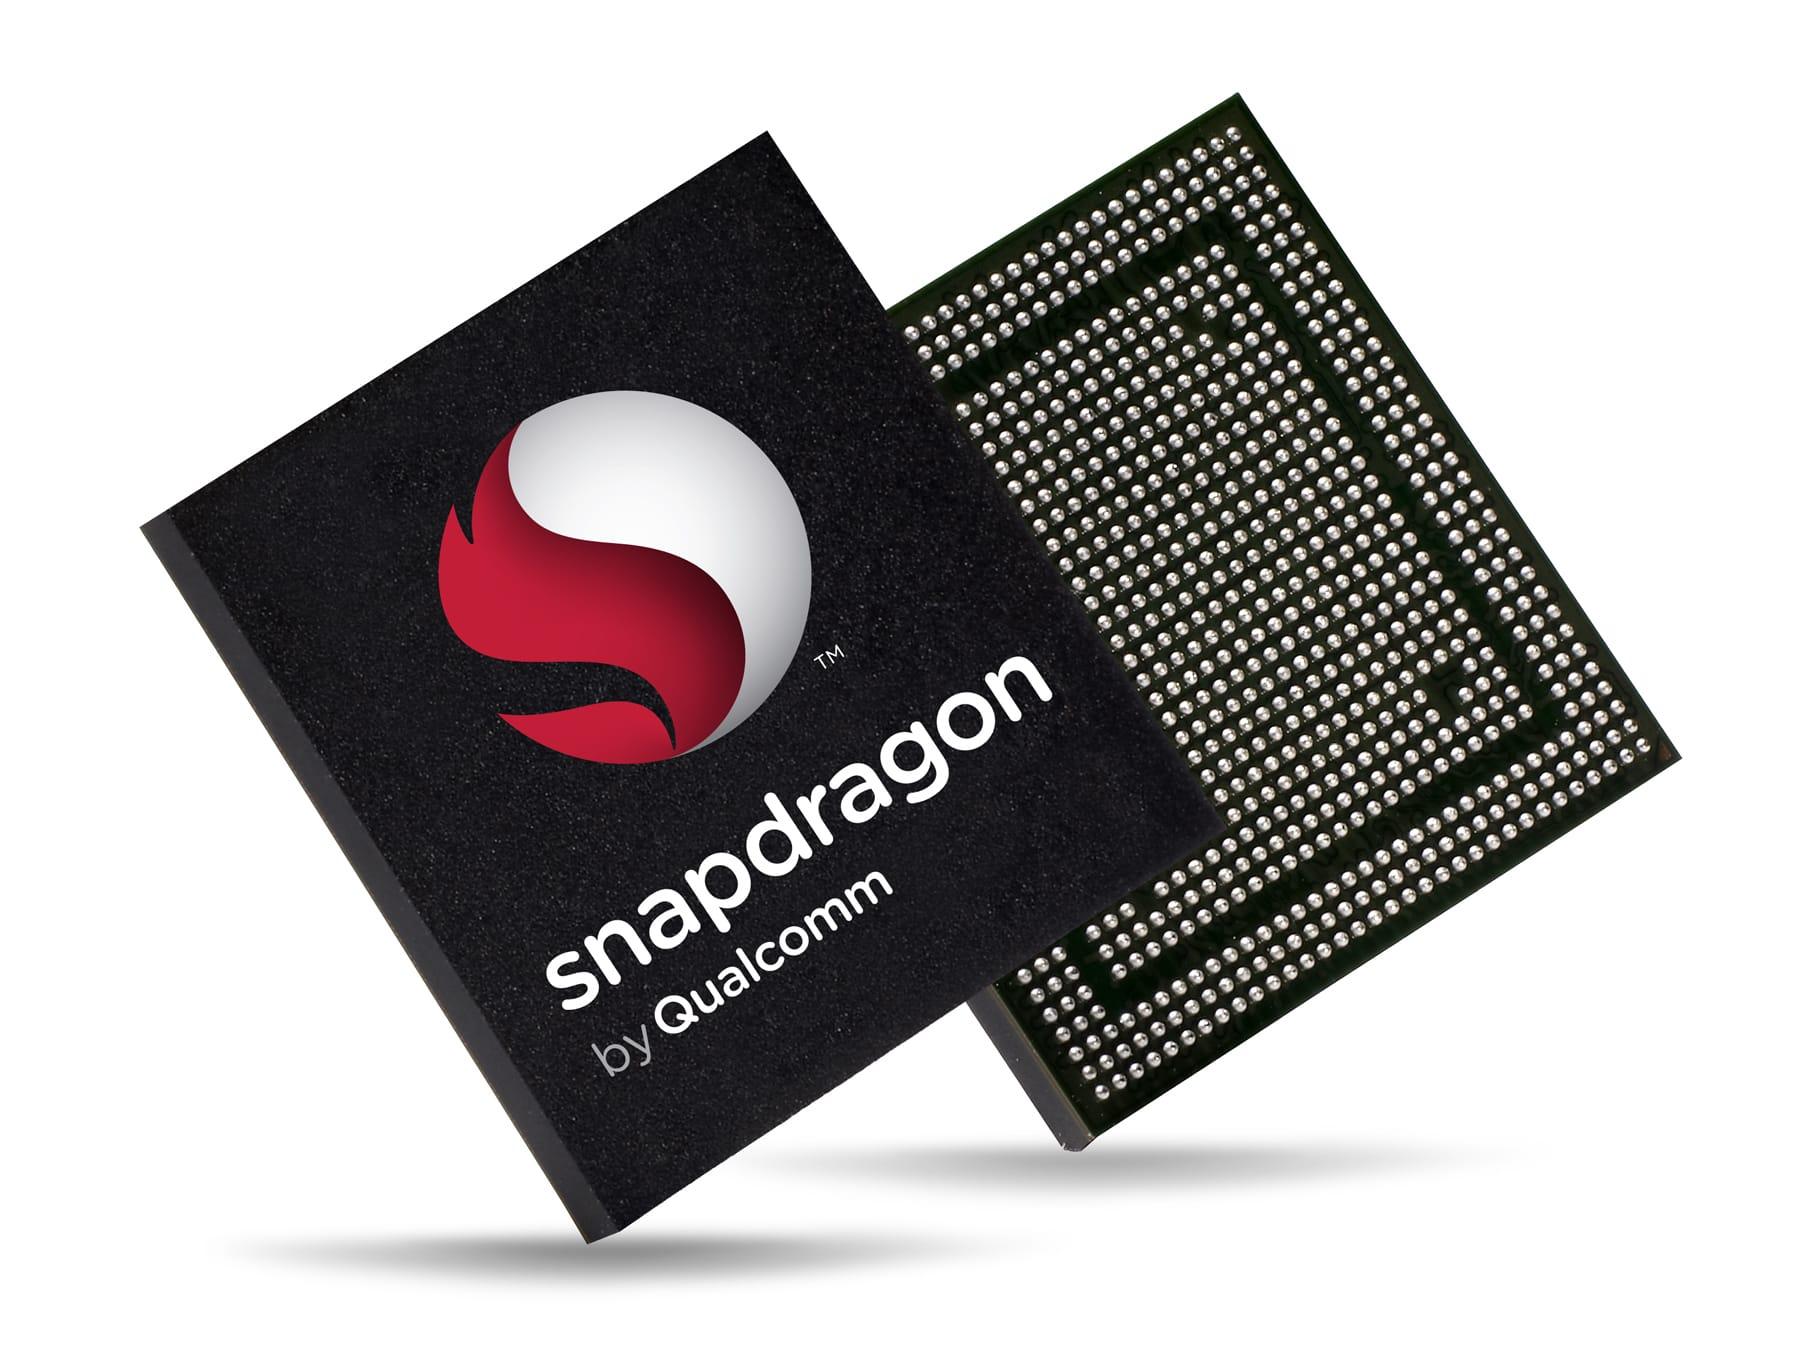 Qualcomm Snapdragon 2